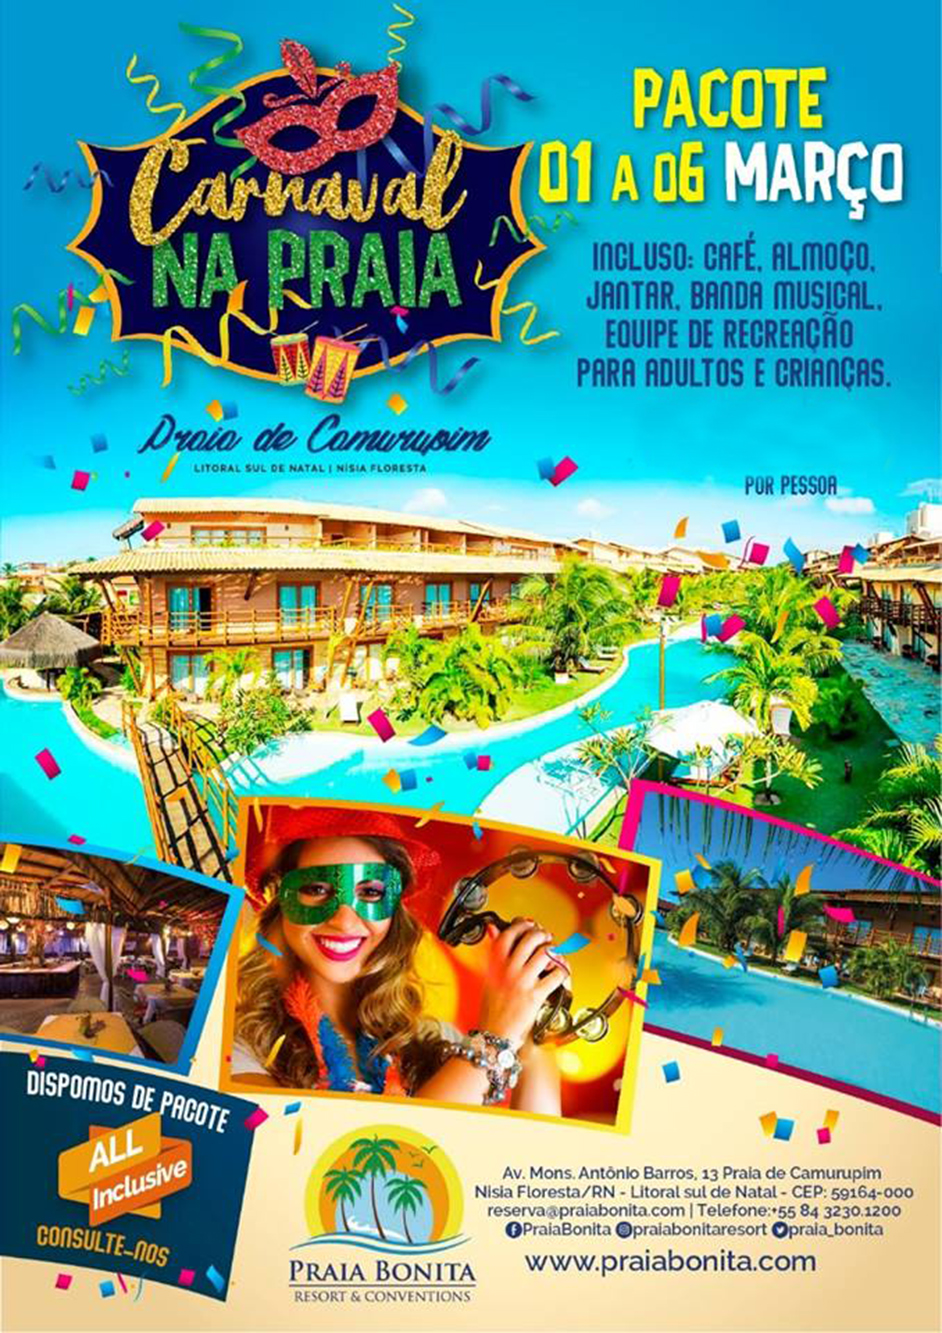 Praia Bonita Resort - Carnaval - turismoonline.net.br